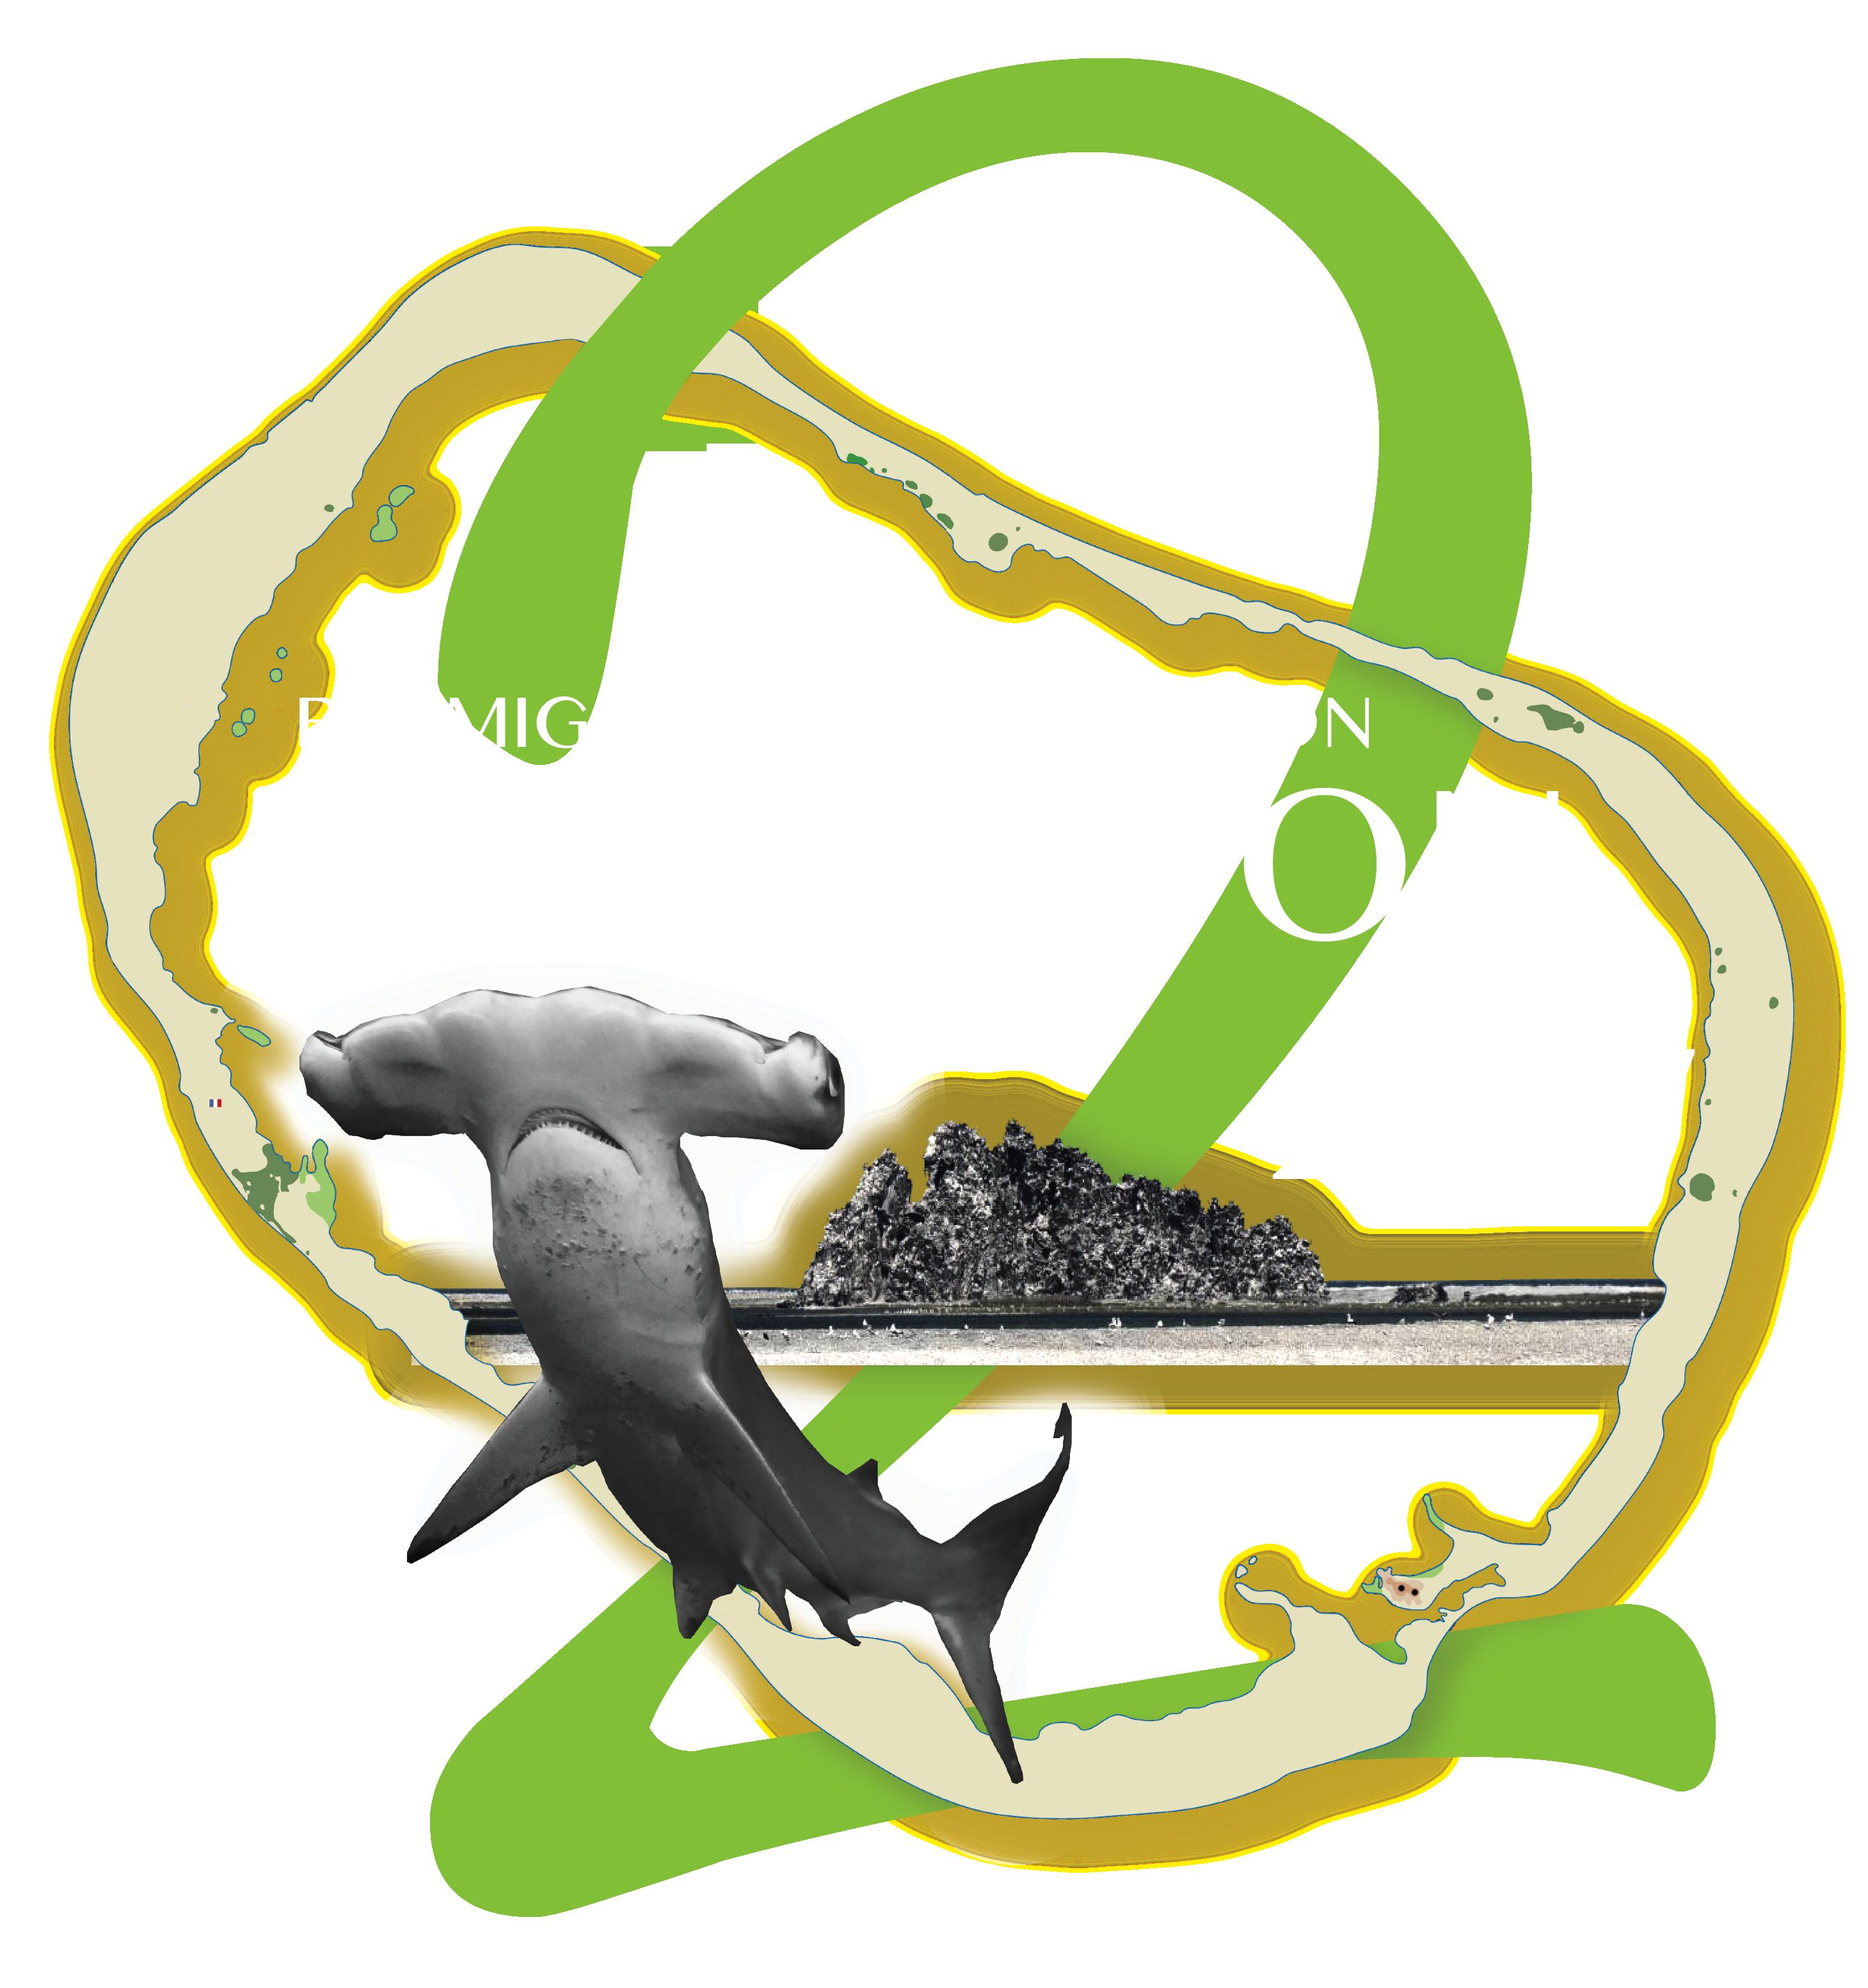 Clipperton expedition scuba dive. Diver clipart marine science